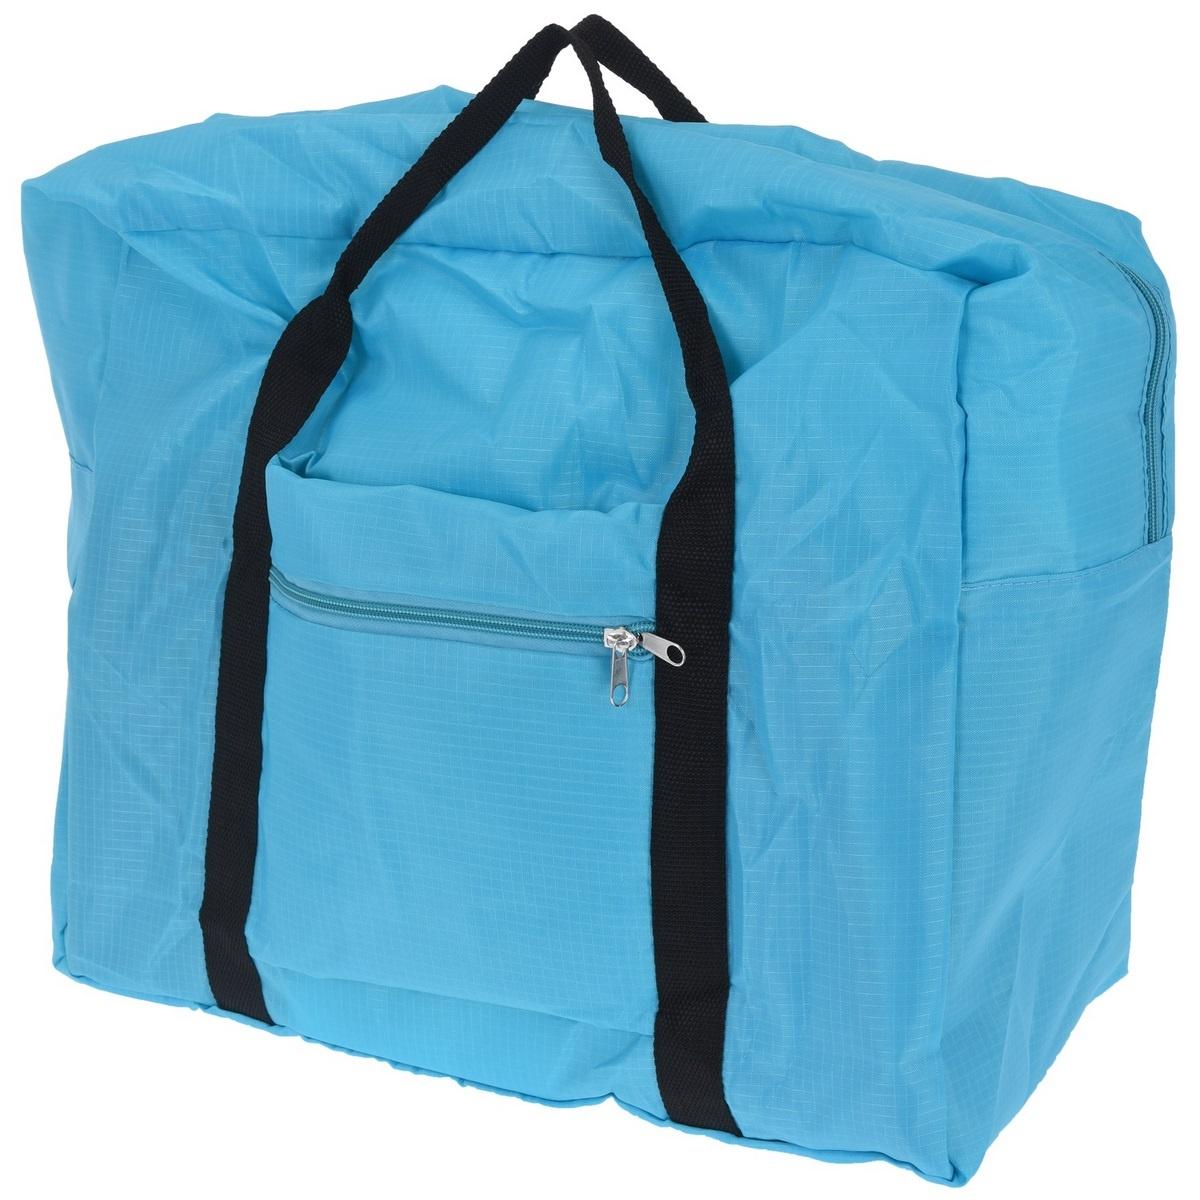 c1c309ea08 Koopman Skladacia cestovná taška svetlomodrá